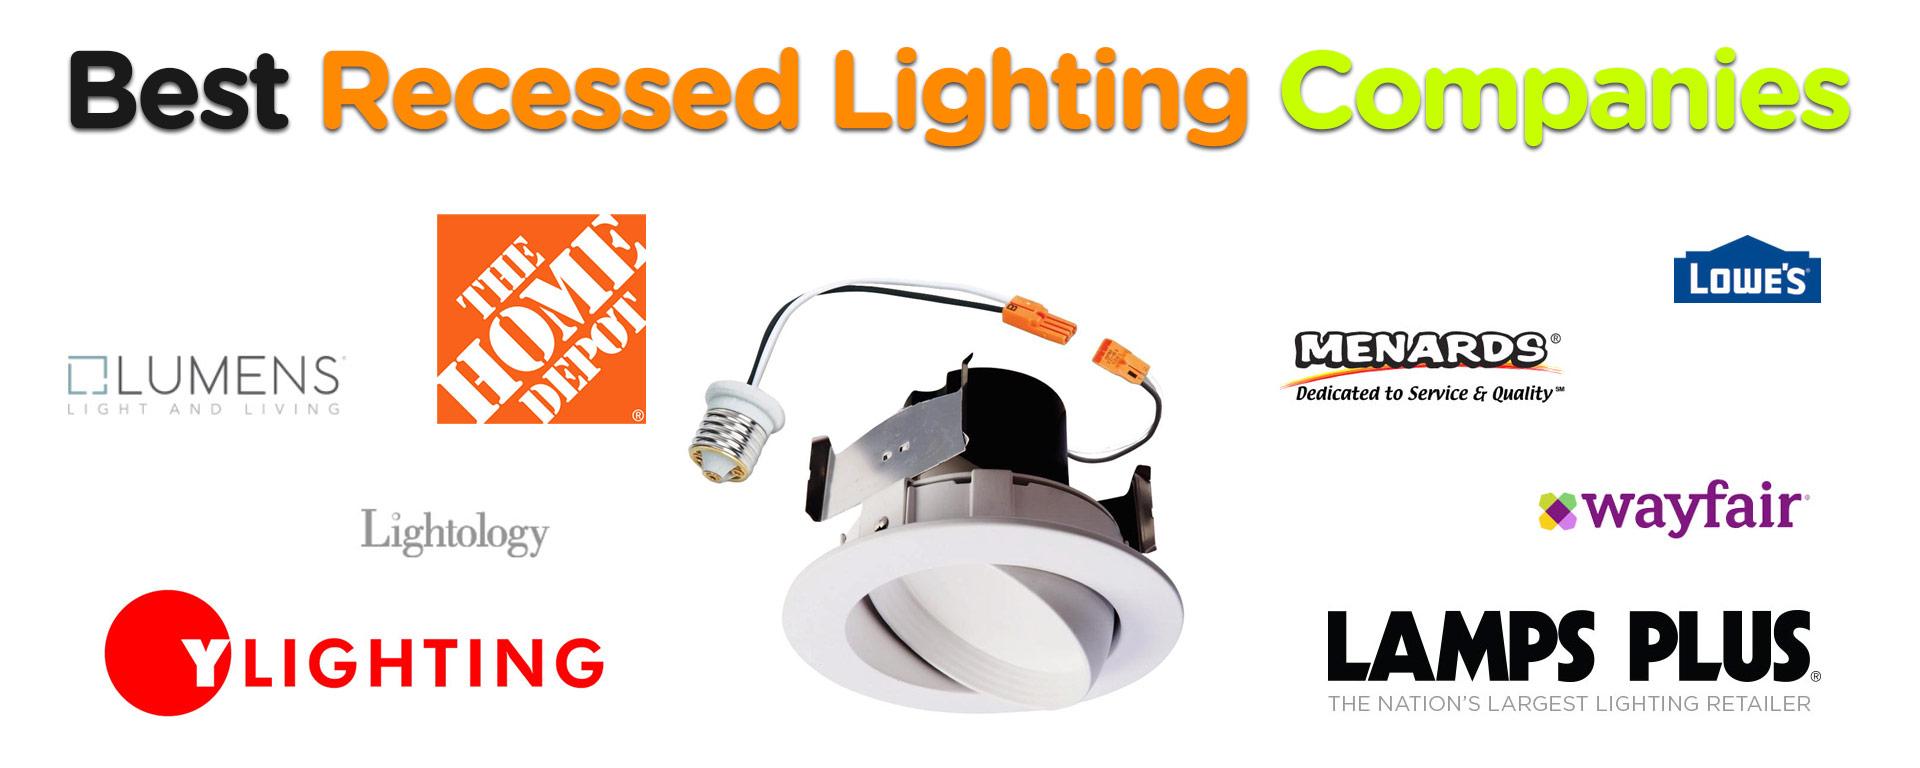 Recessed Lighting Companies Reviews